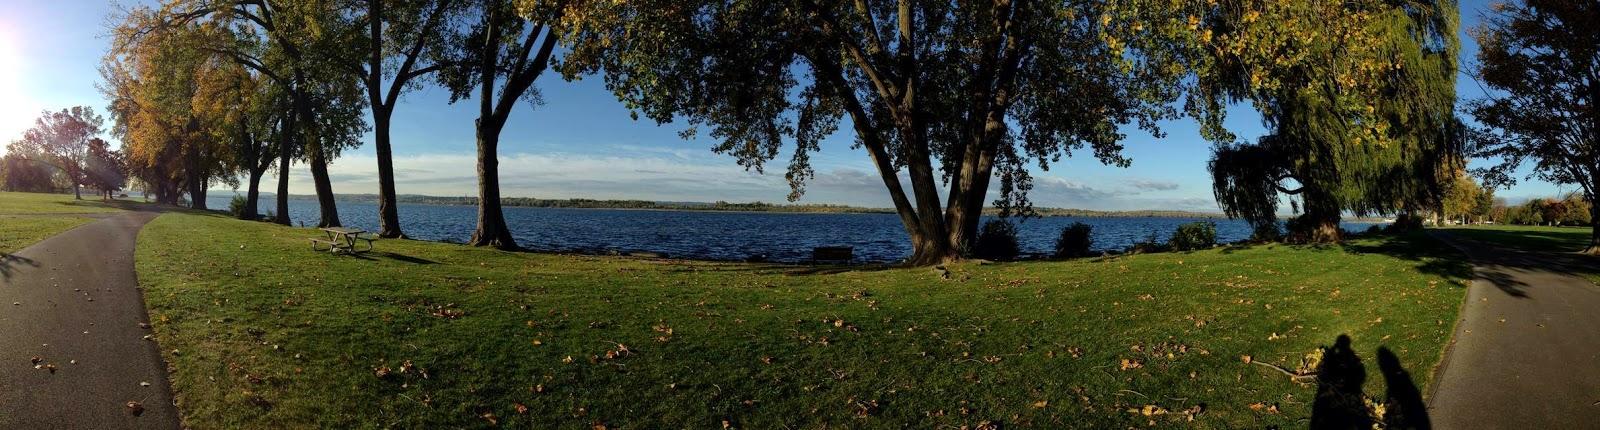 Lake Onondaga